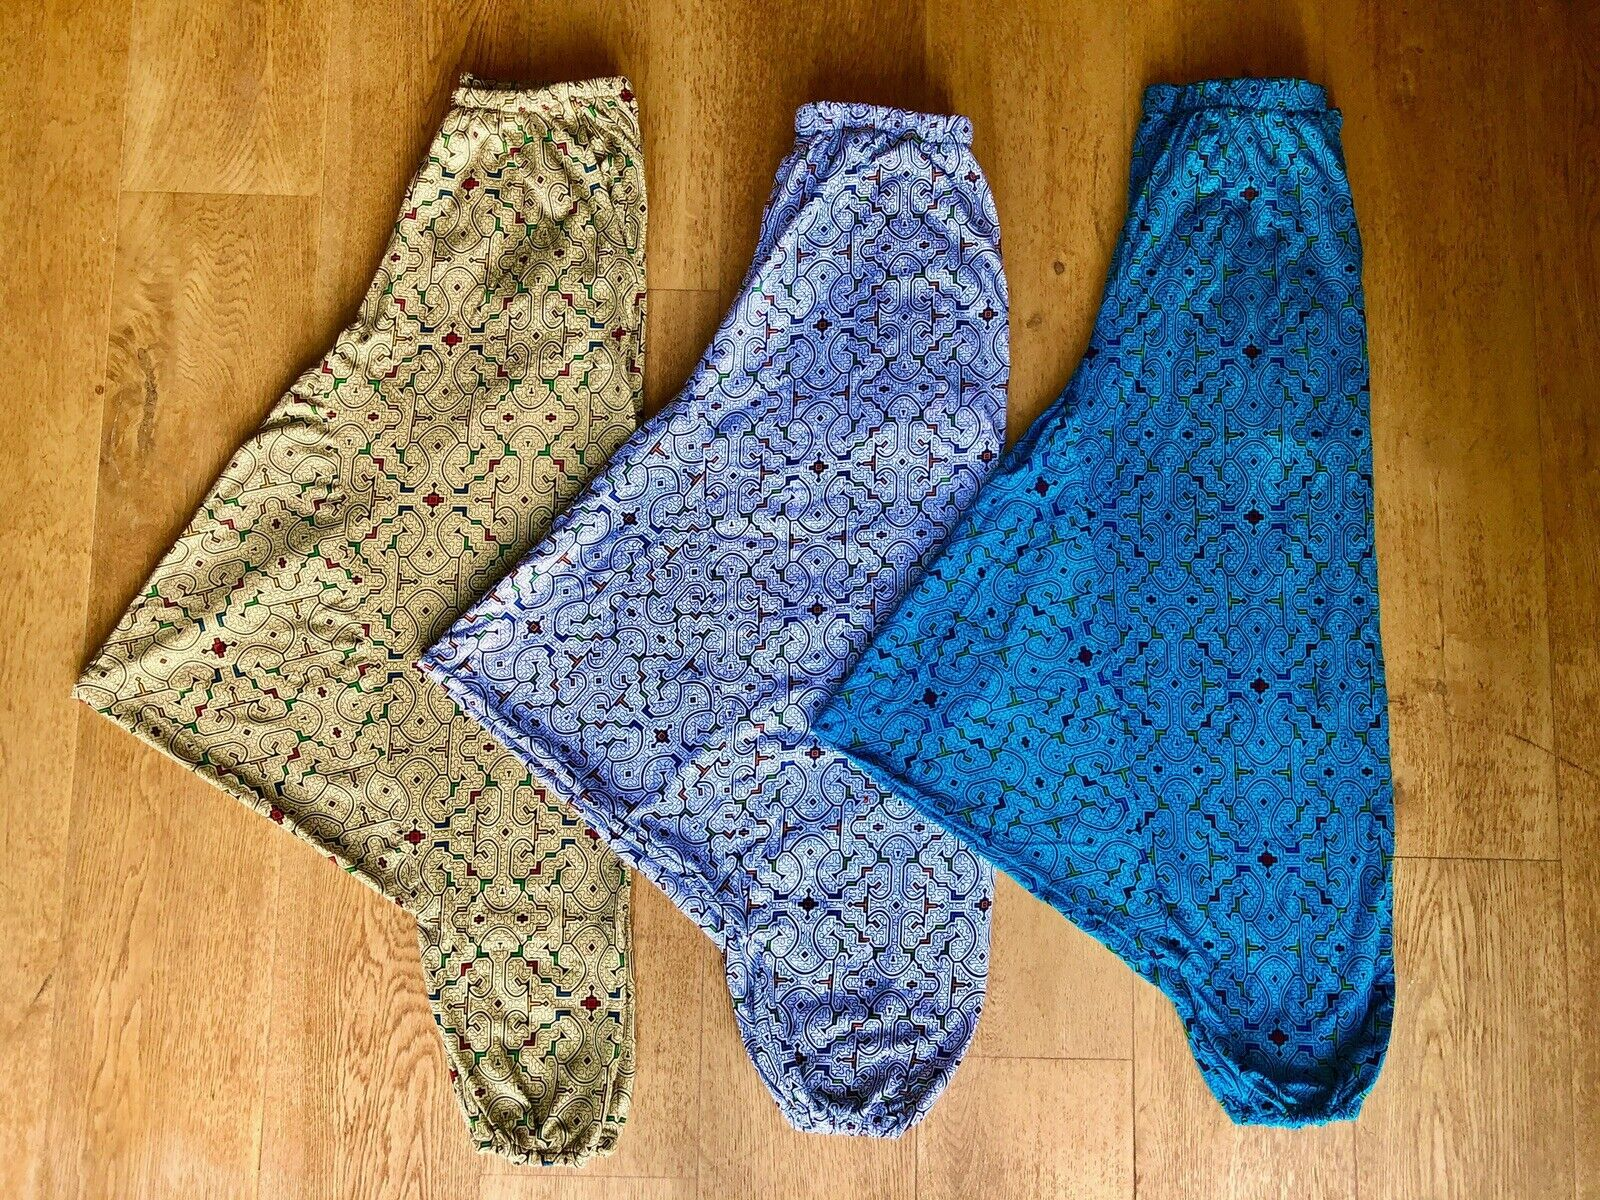 Handmade Shipibo Print Harem 100% Peruvian Cotton Pants.